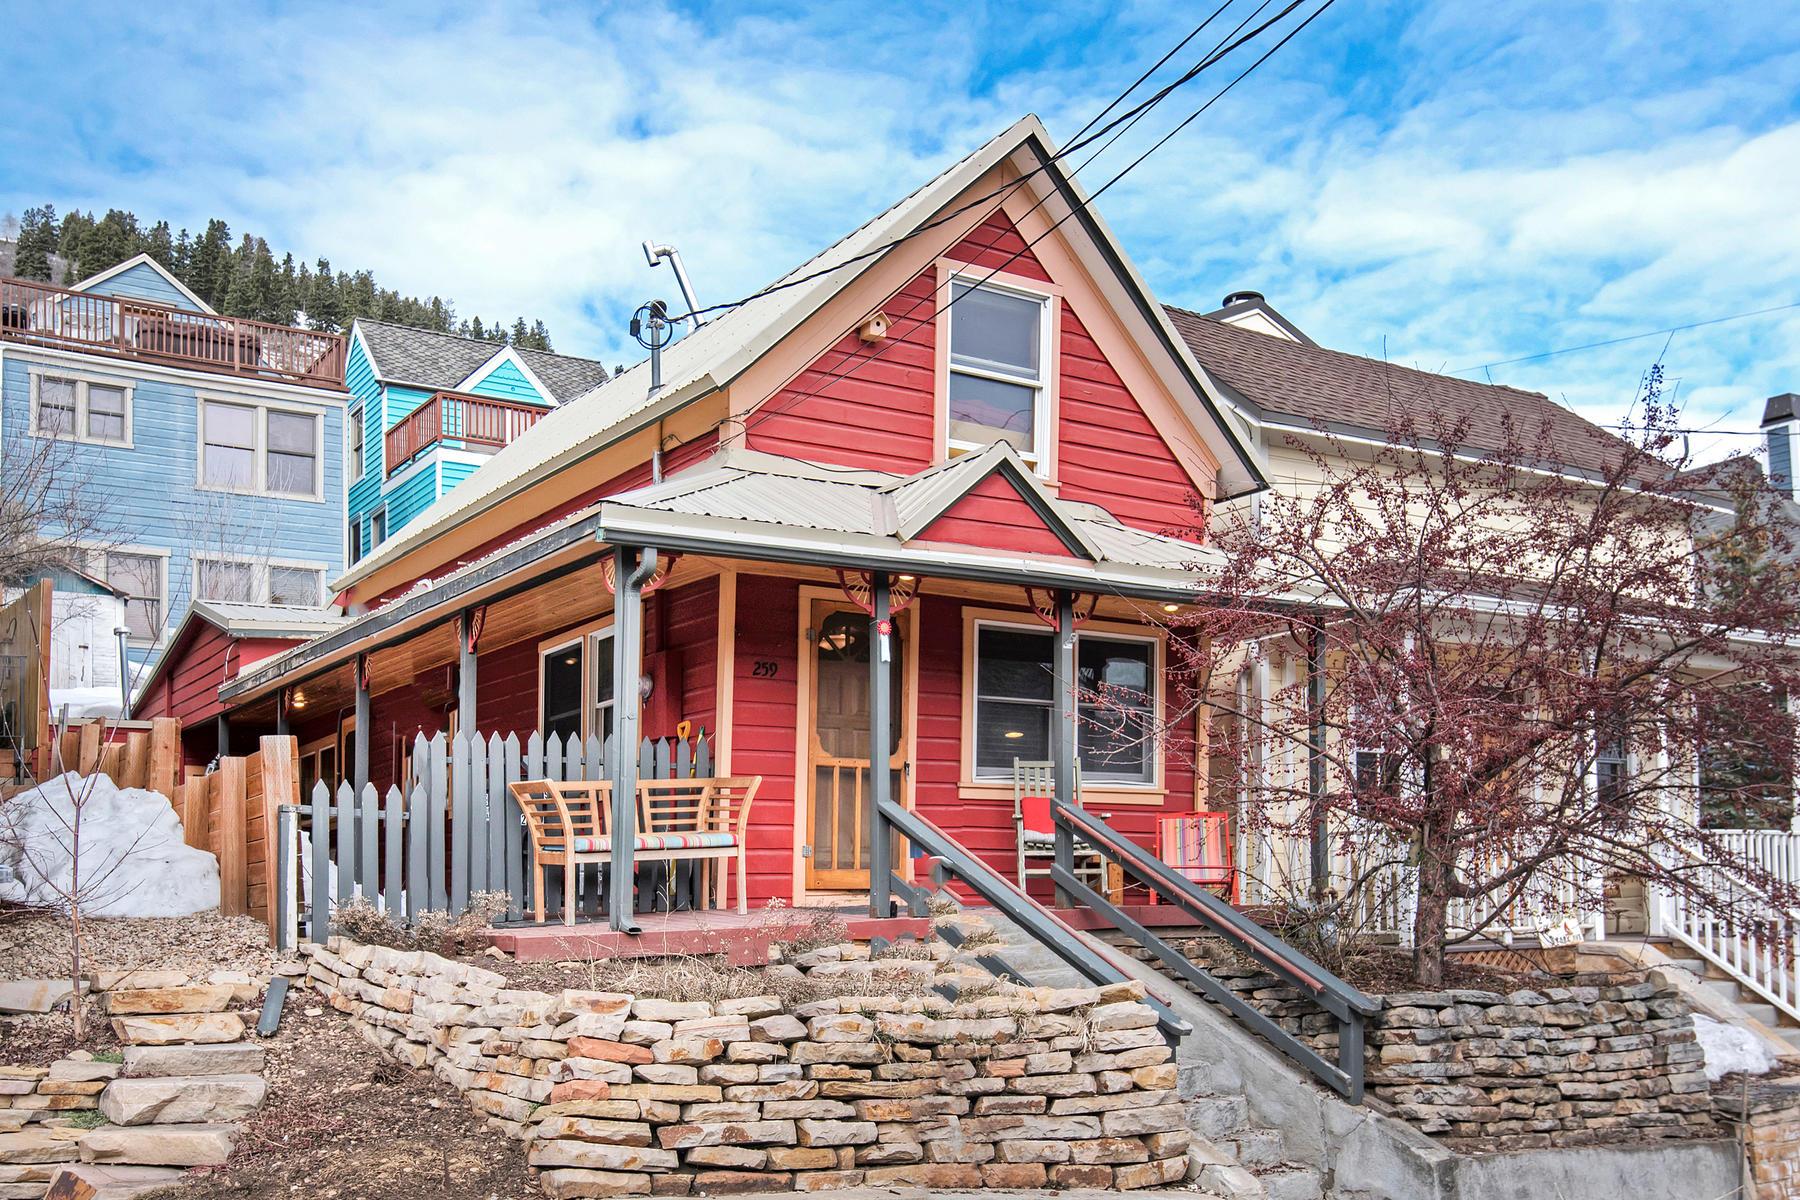 Частный односемейный дом для того Продажа на Rebuilt Historic Home Steps to Main Street & Ski Slopes 259 Park Ave Park City, Юта, 84060 Соединенные Штаты